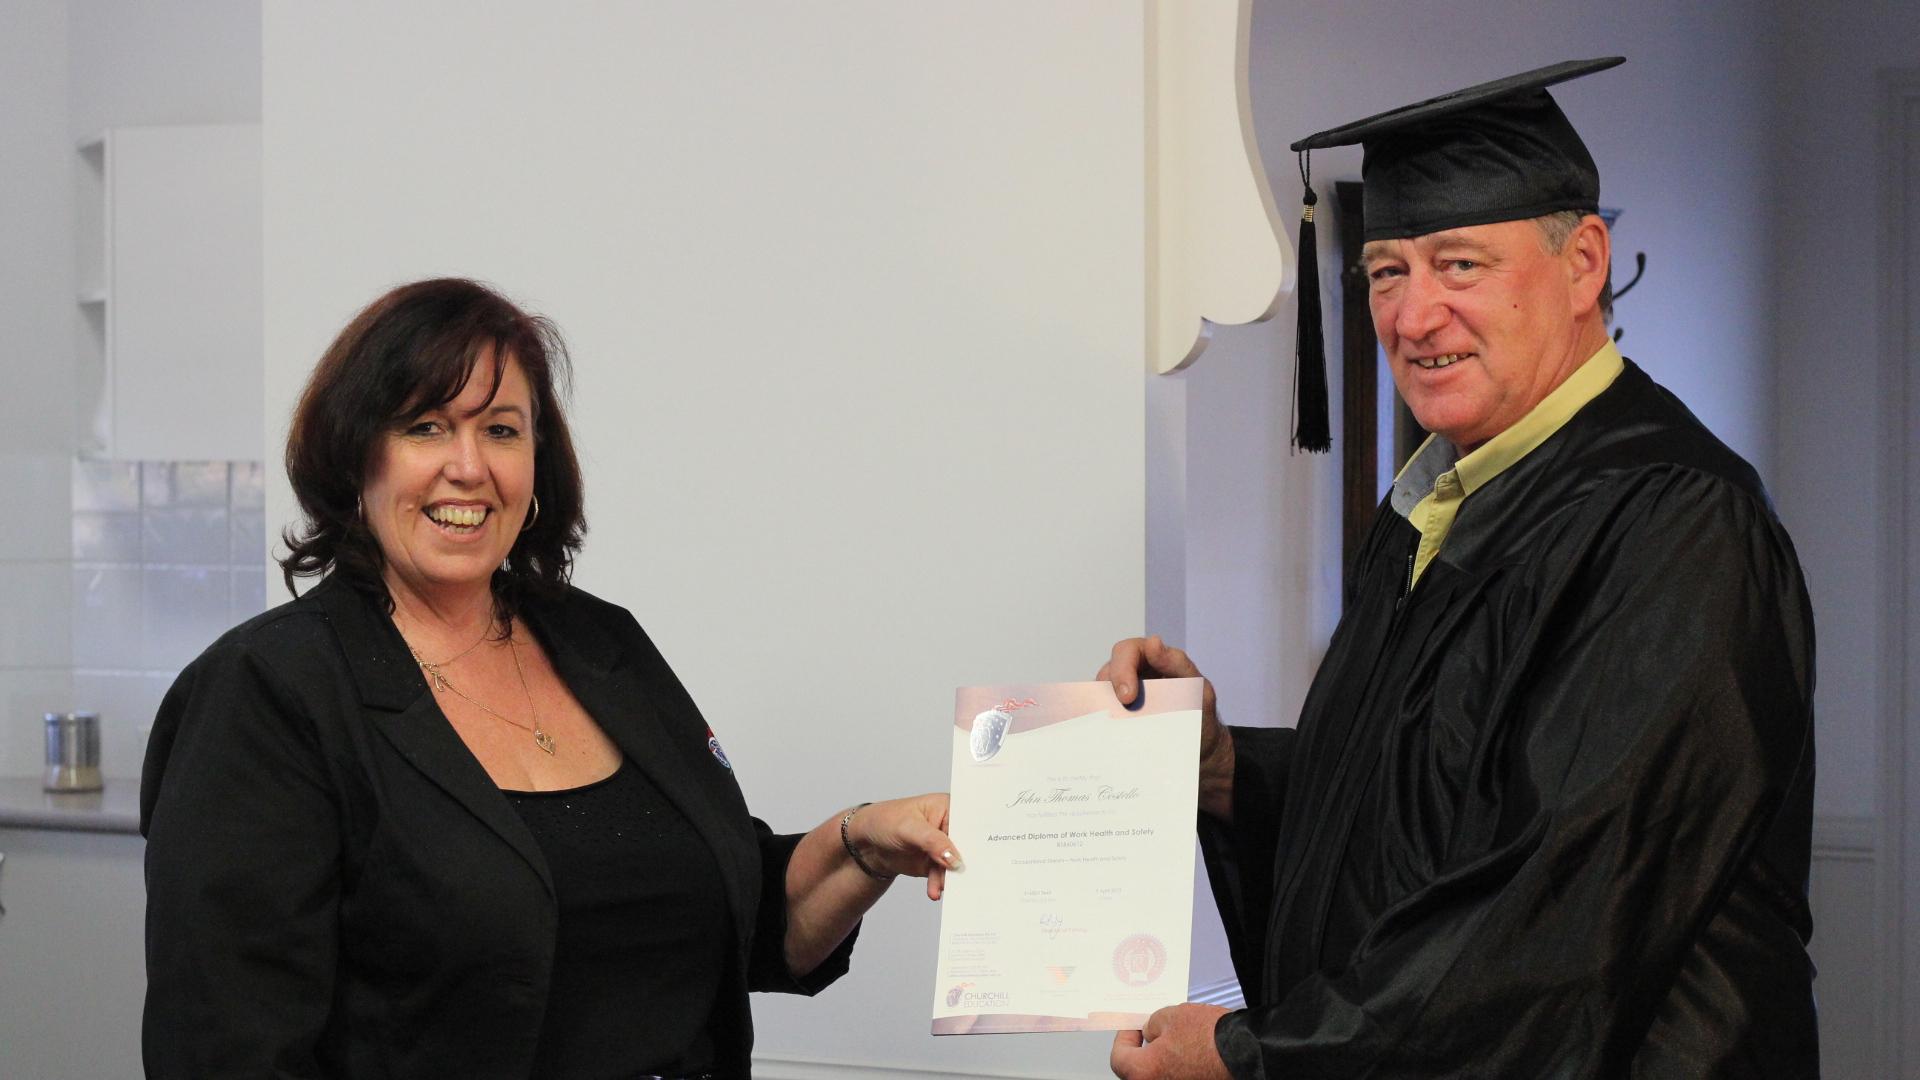 Churchill Education Alumni John Costello